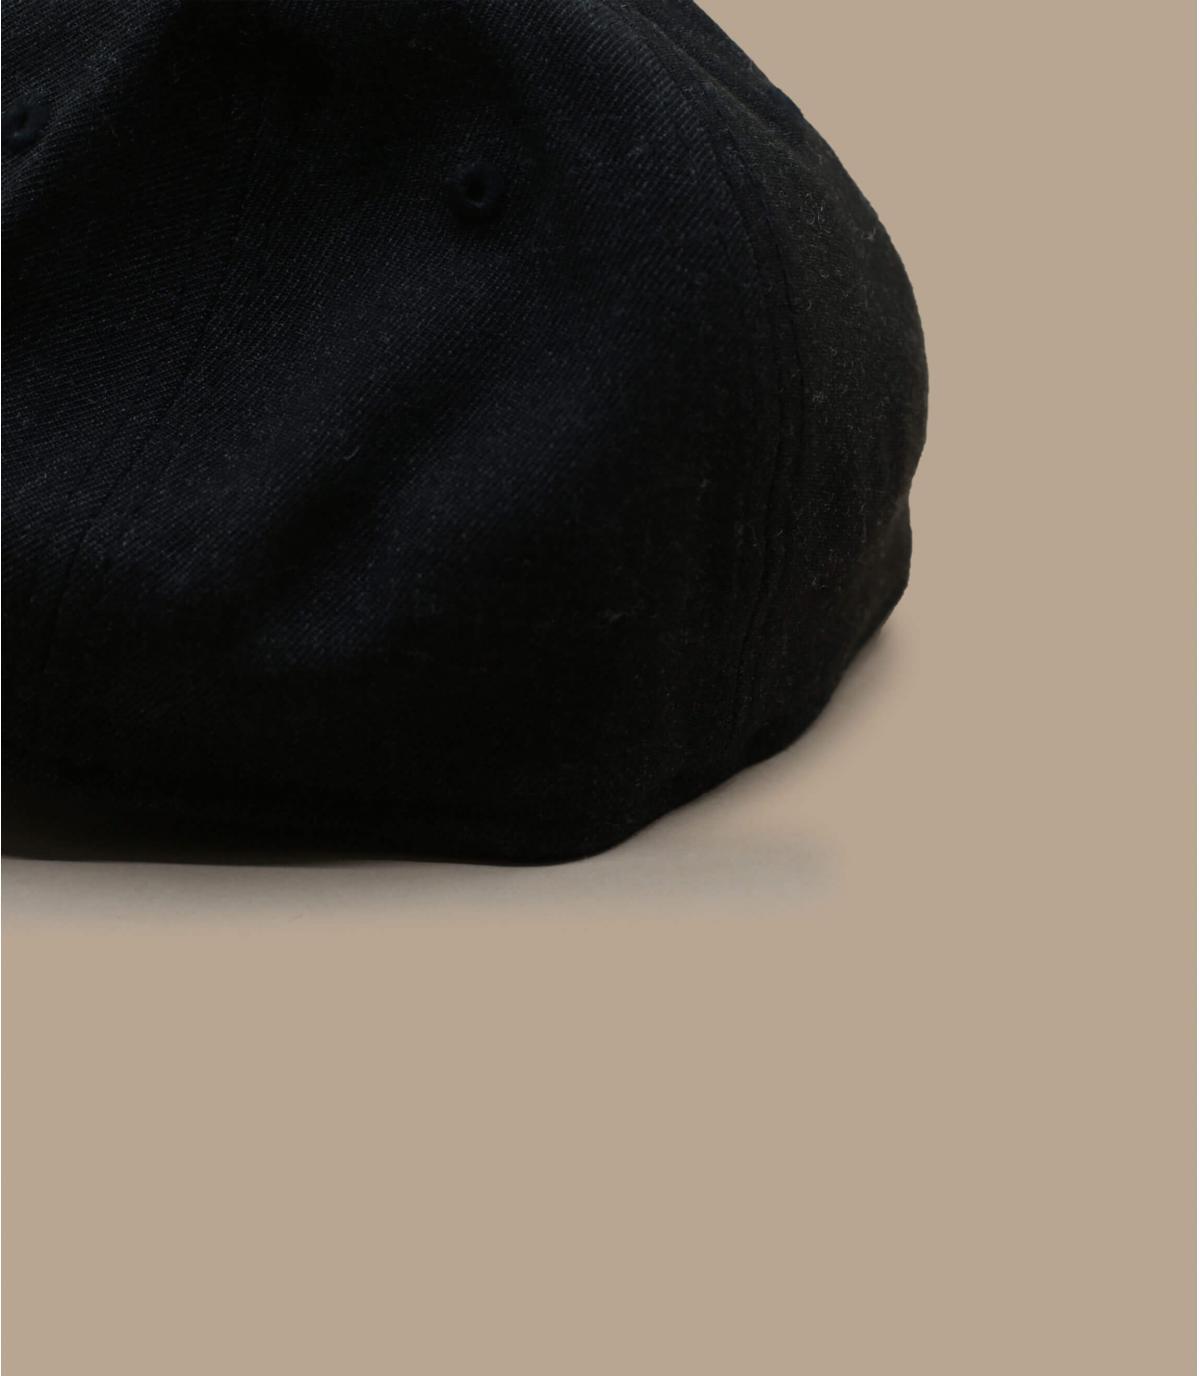 Dettagli MLB melton 9Fifty NY black - image 4